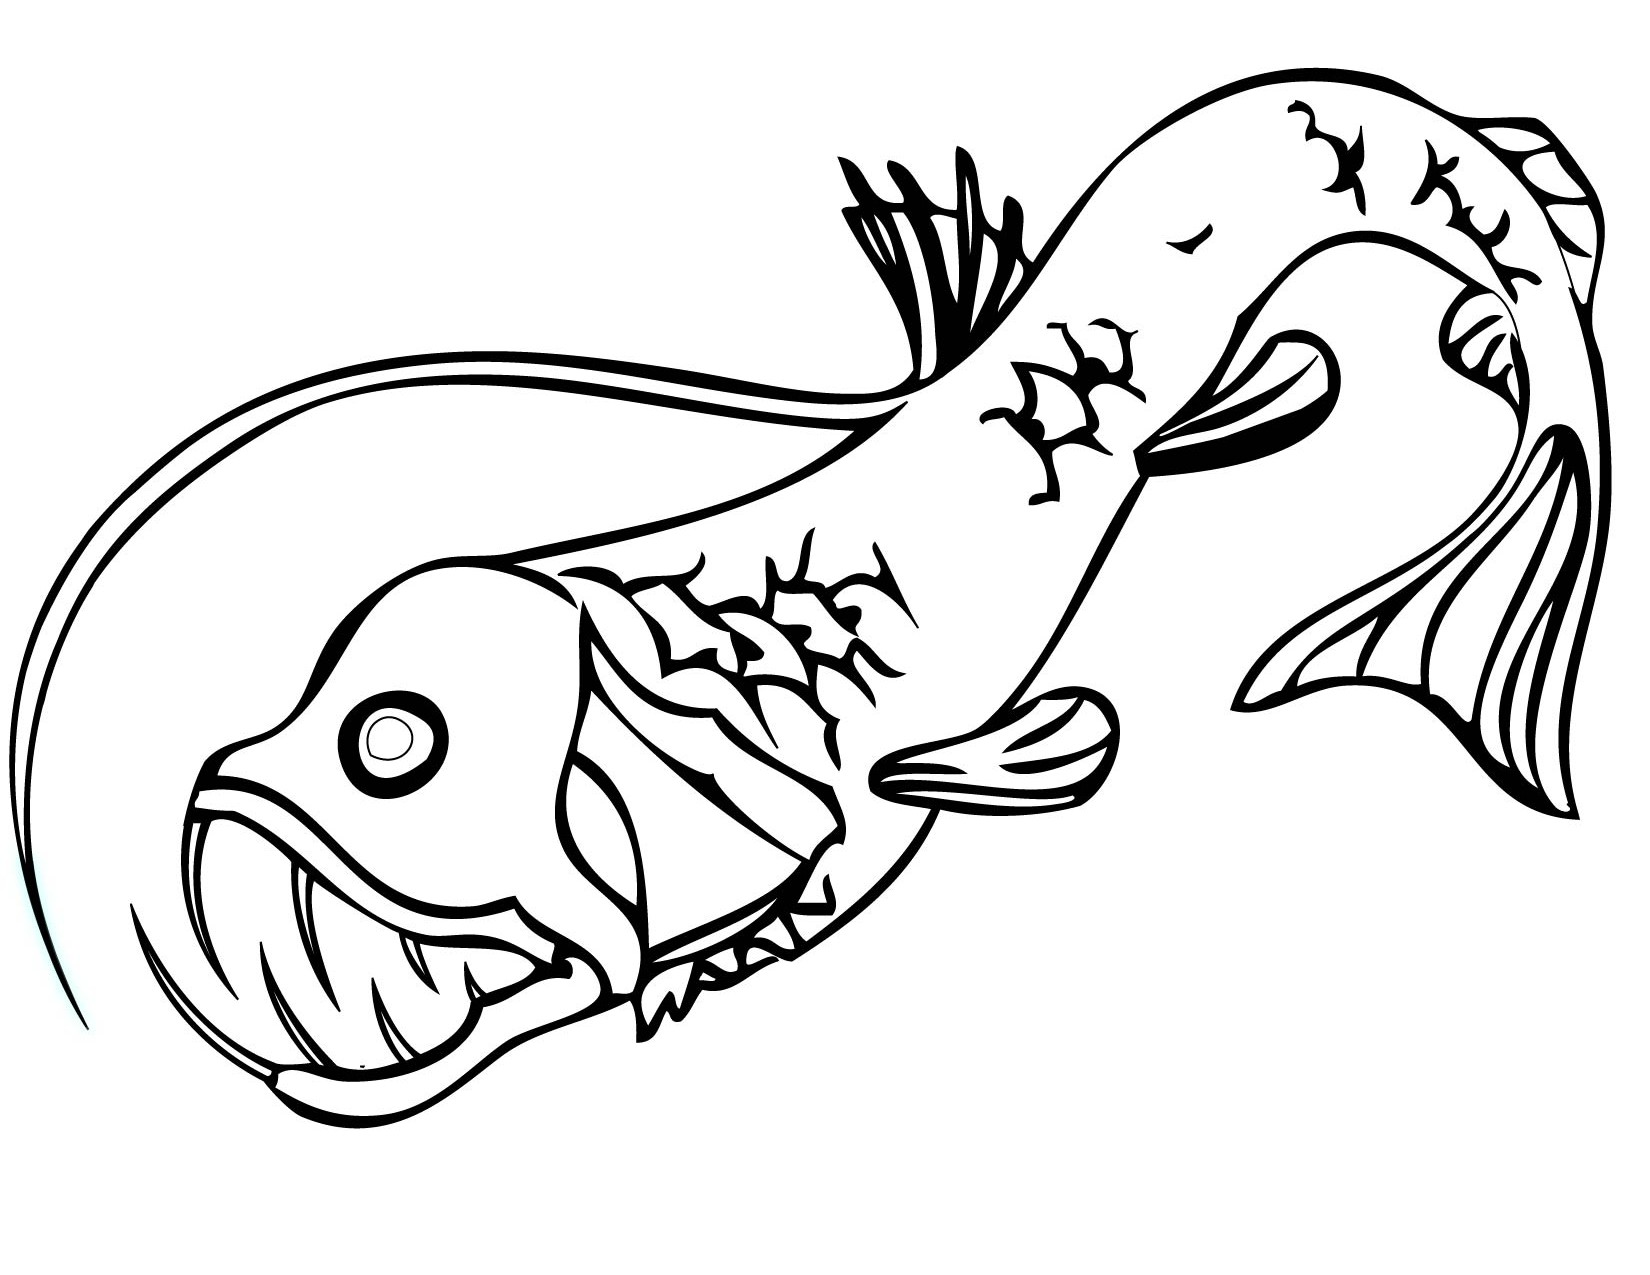 1650x1275 Angler Fish Coloring Page